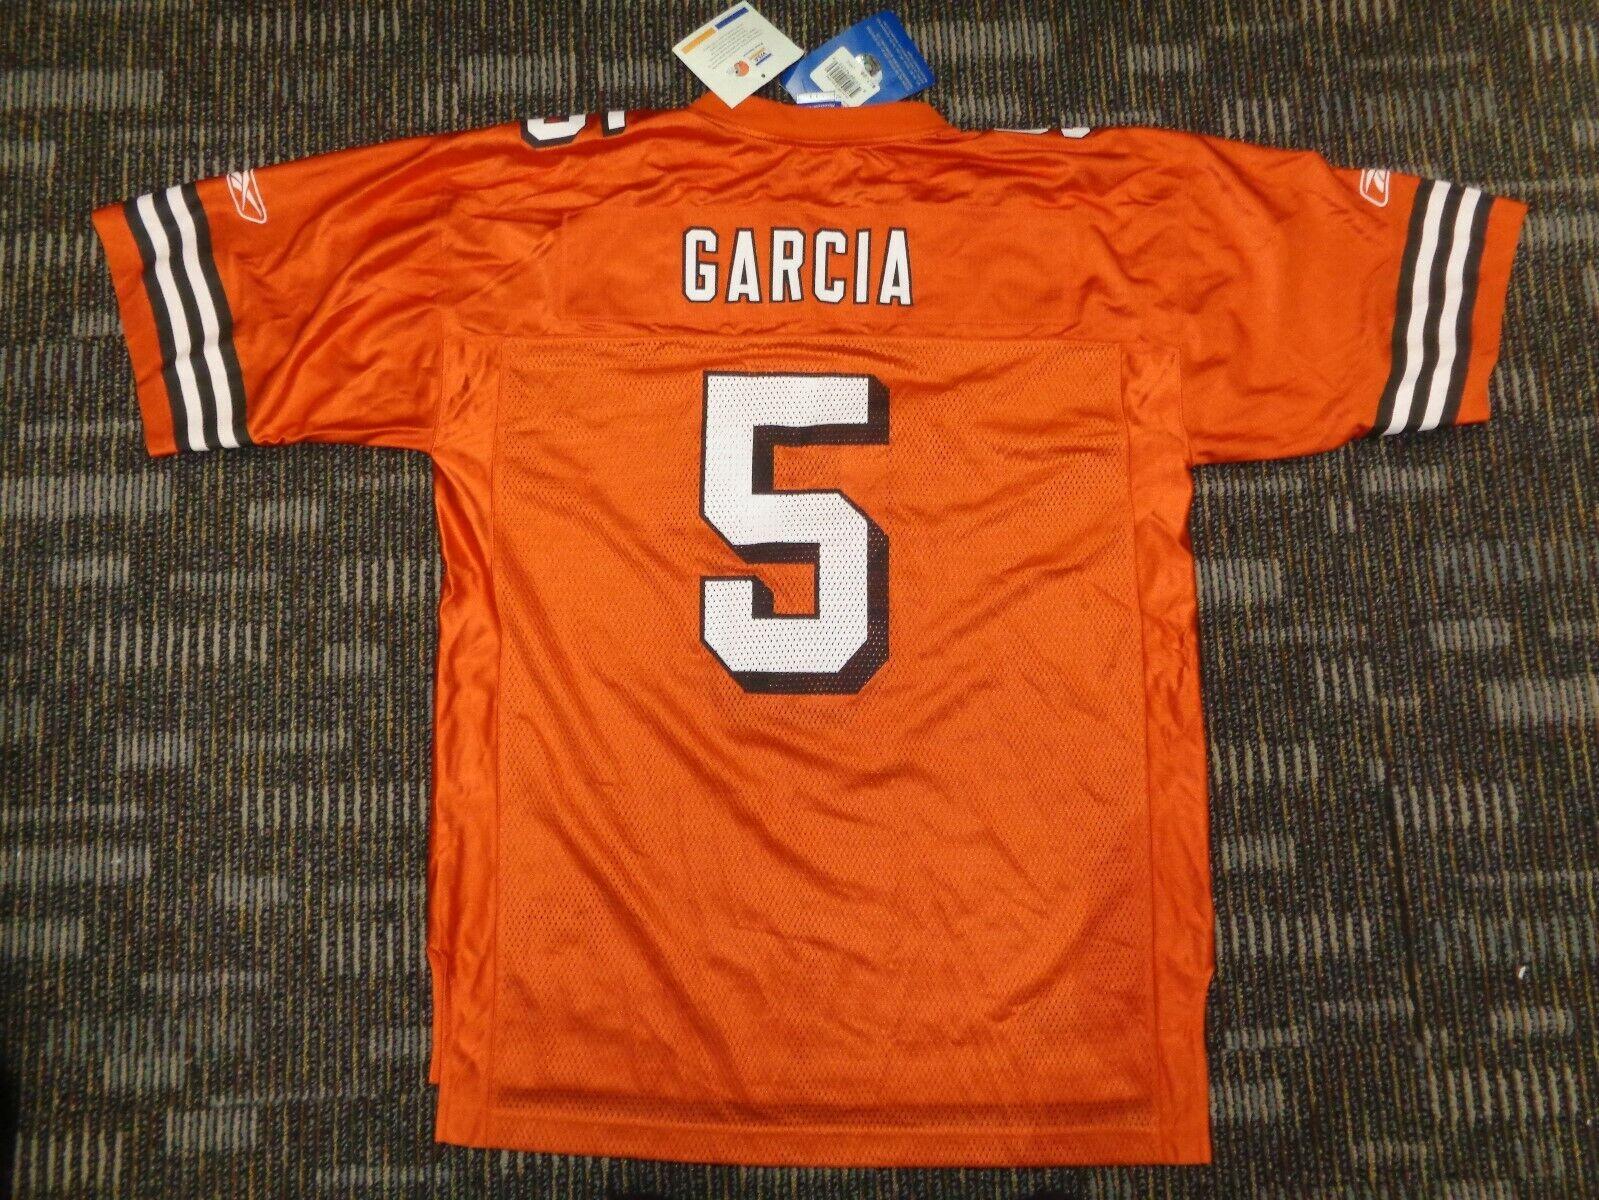 NWT JEFF GARCIA 5 CLEVELAND BROWNS REEBOK NFL CFL ORANGE GAME FOOTBALL JERSEY L - $34.99